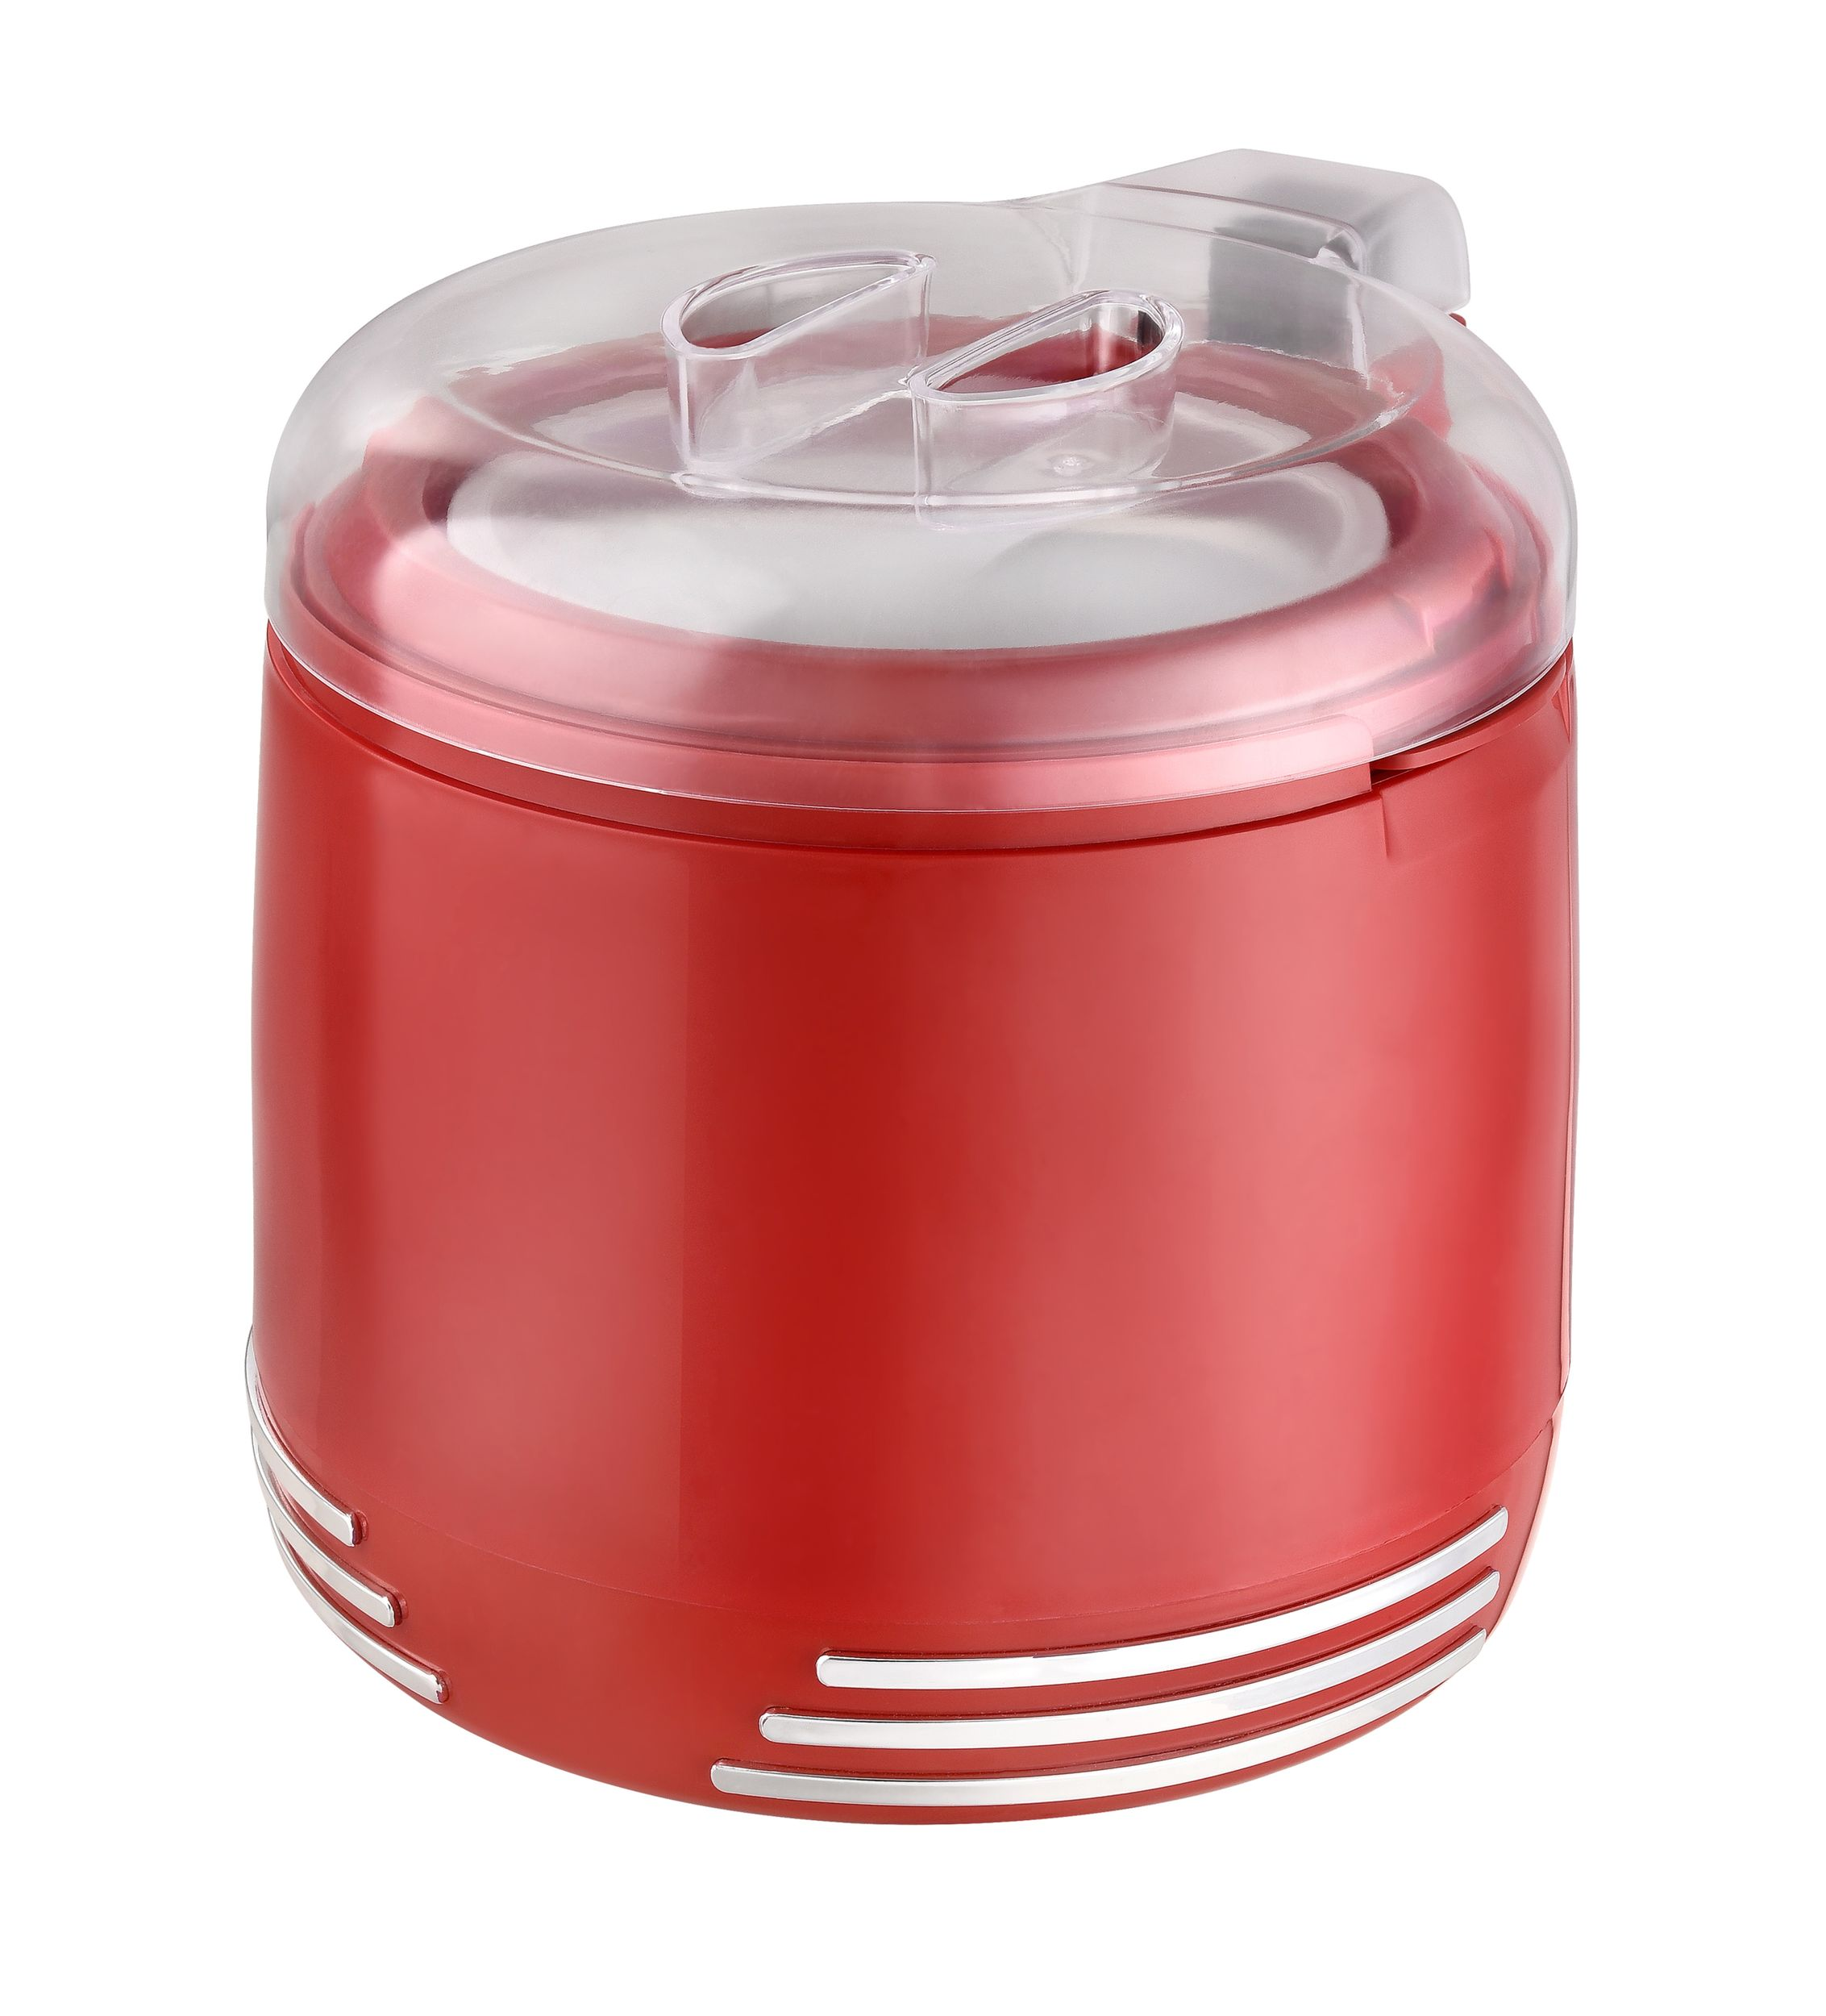 2 in 1 Retro Eismaschine Joghurtbereiter Eiscreme Joghurt Maker Kühlgefäß rot NEU 15 W *94074 Bild 6